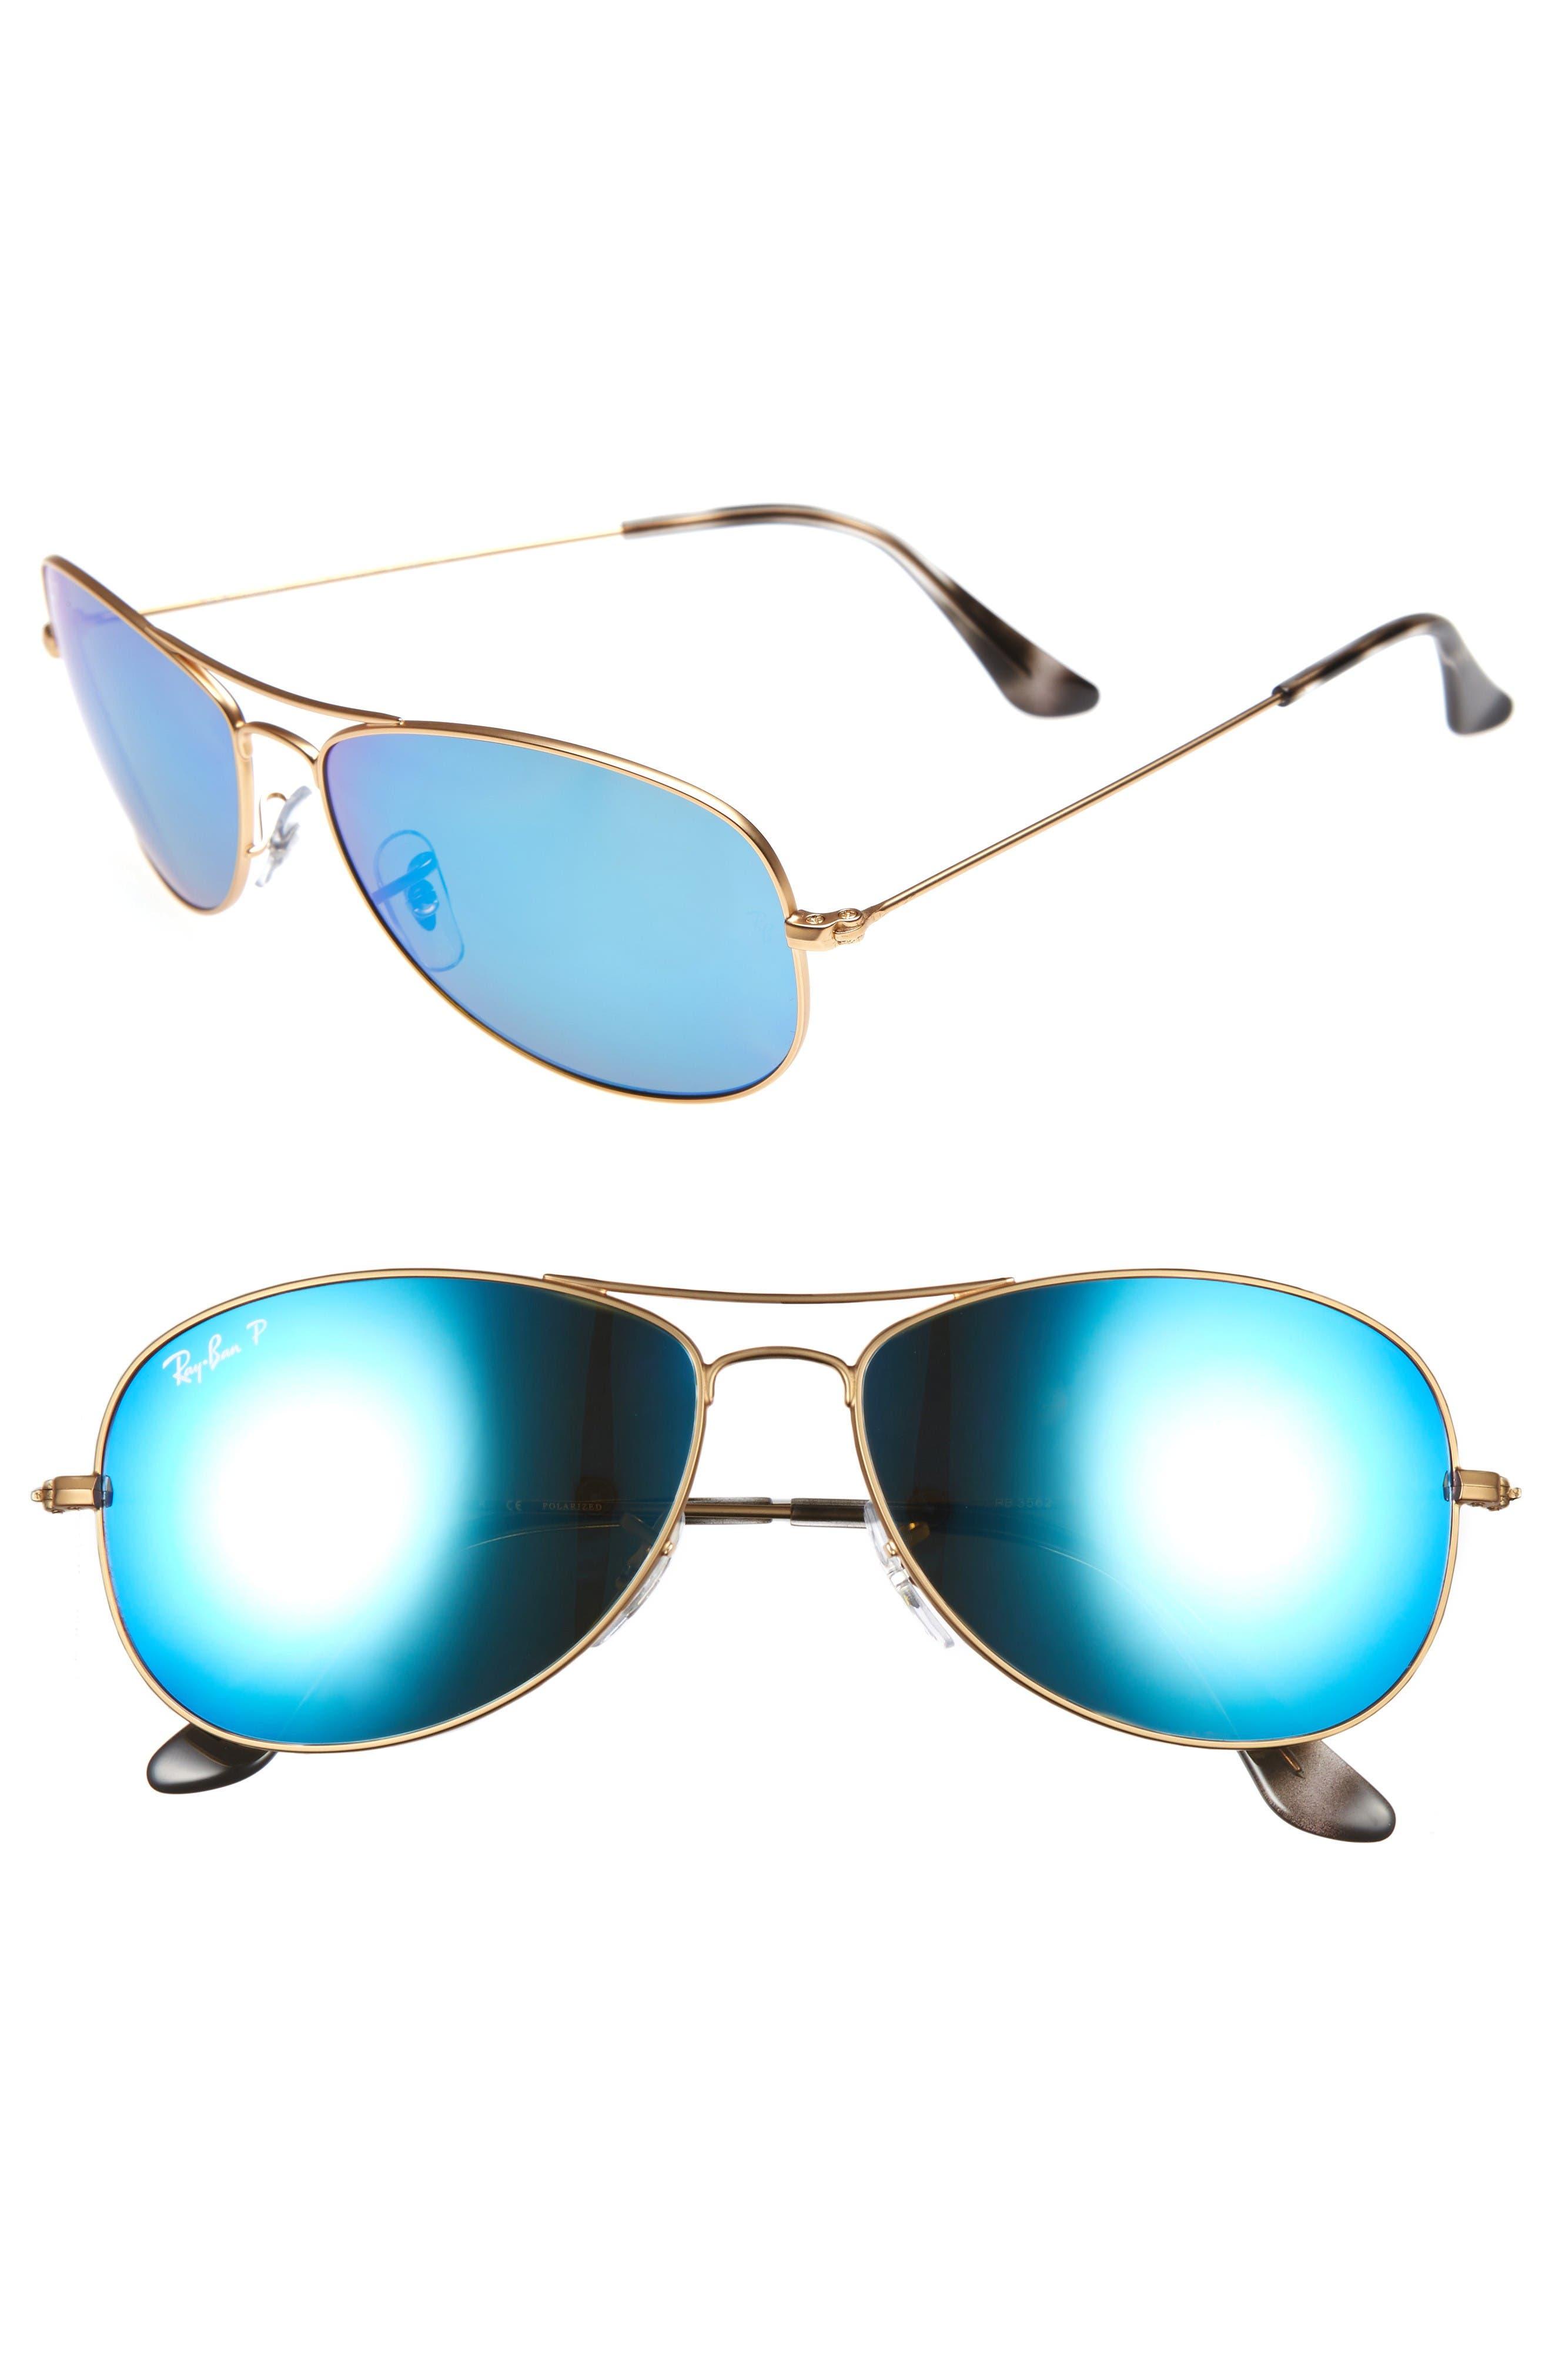 Ray-Ban 59mm Chromance Aviator Sunglasses